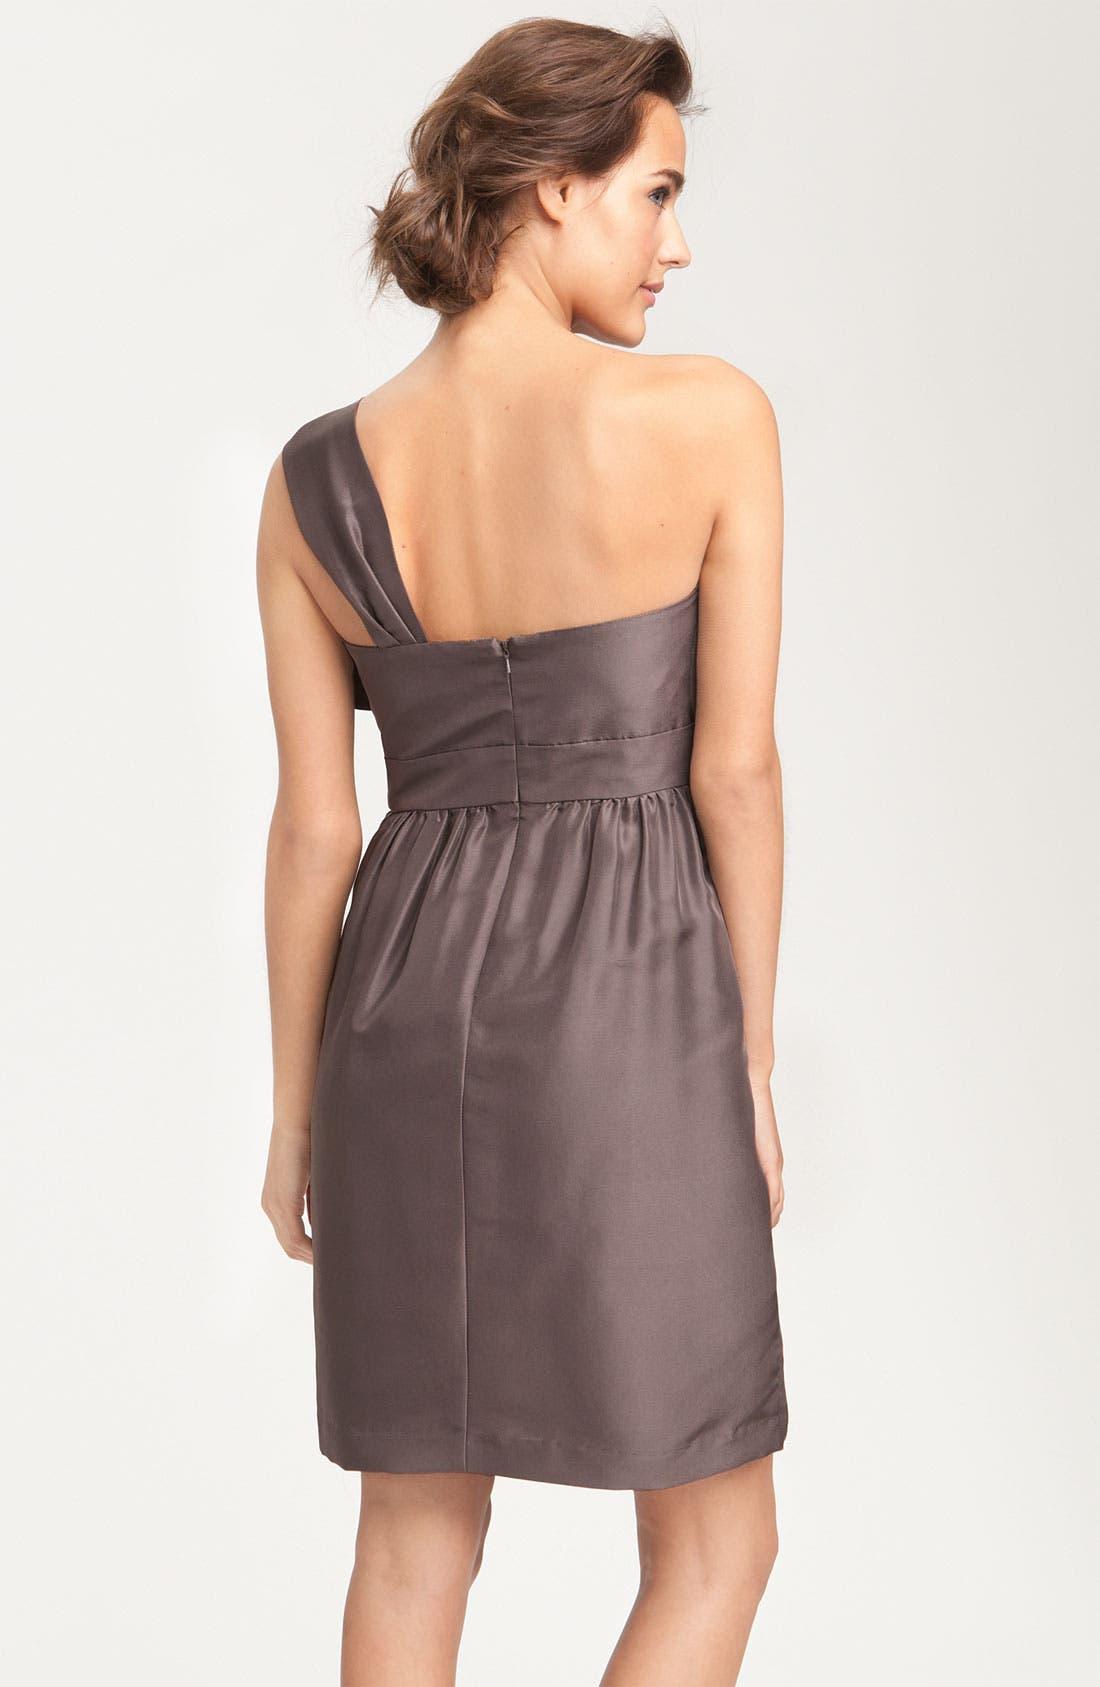 JENNY YOO, Convertible Shantung Dress, Alternate thumbnail 4, color, 020